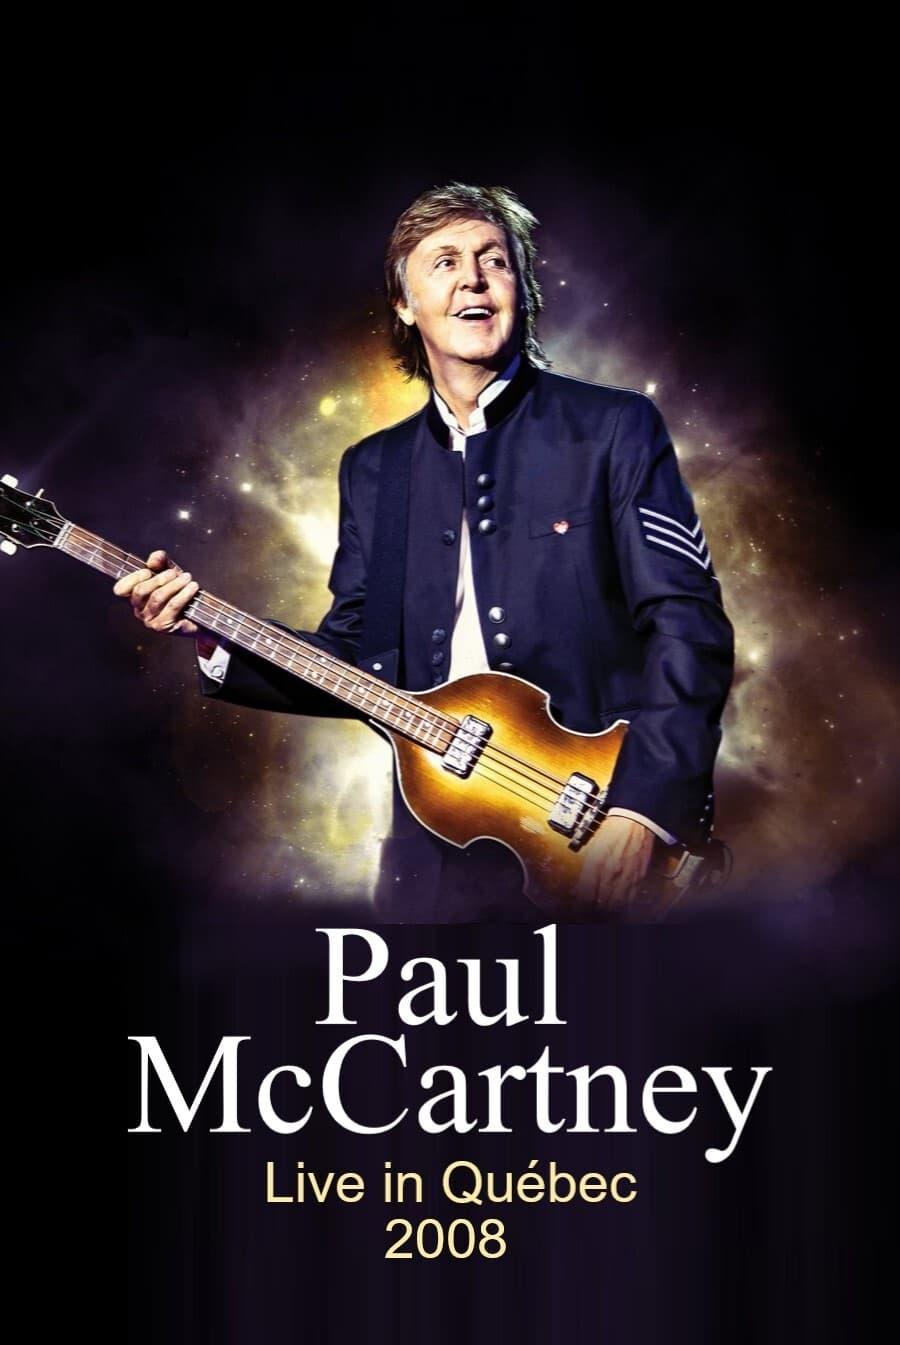 Paul McCartney Live in Quebec 7/20/2008